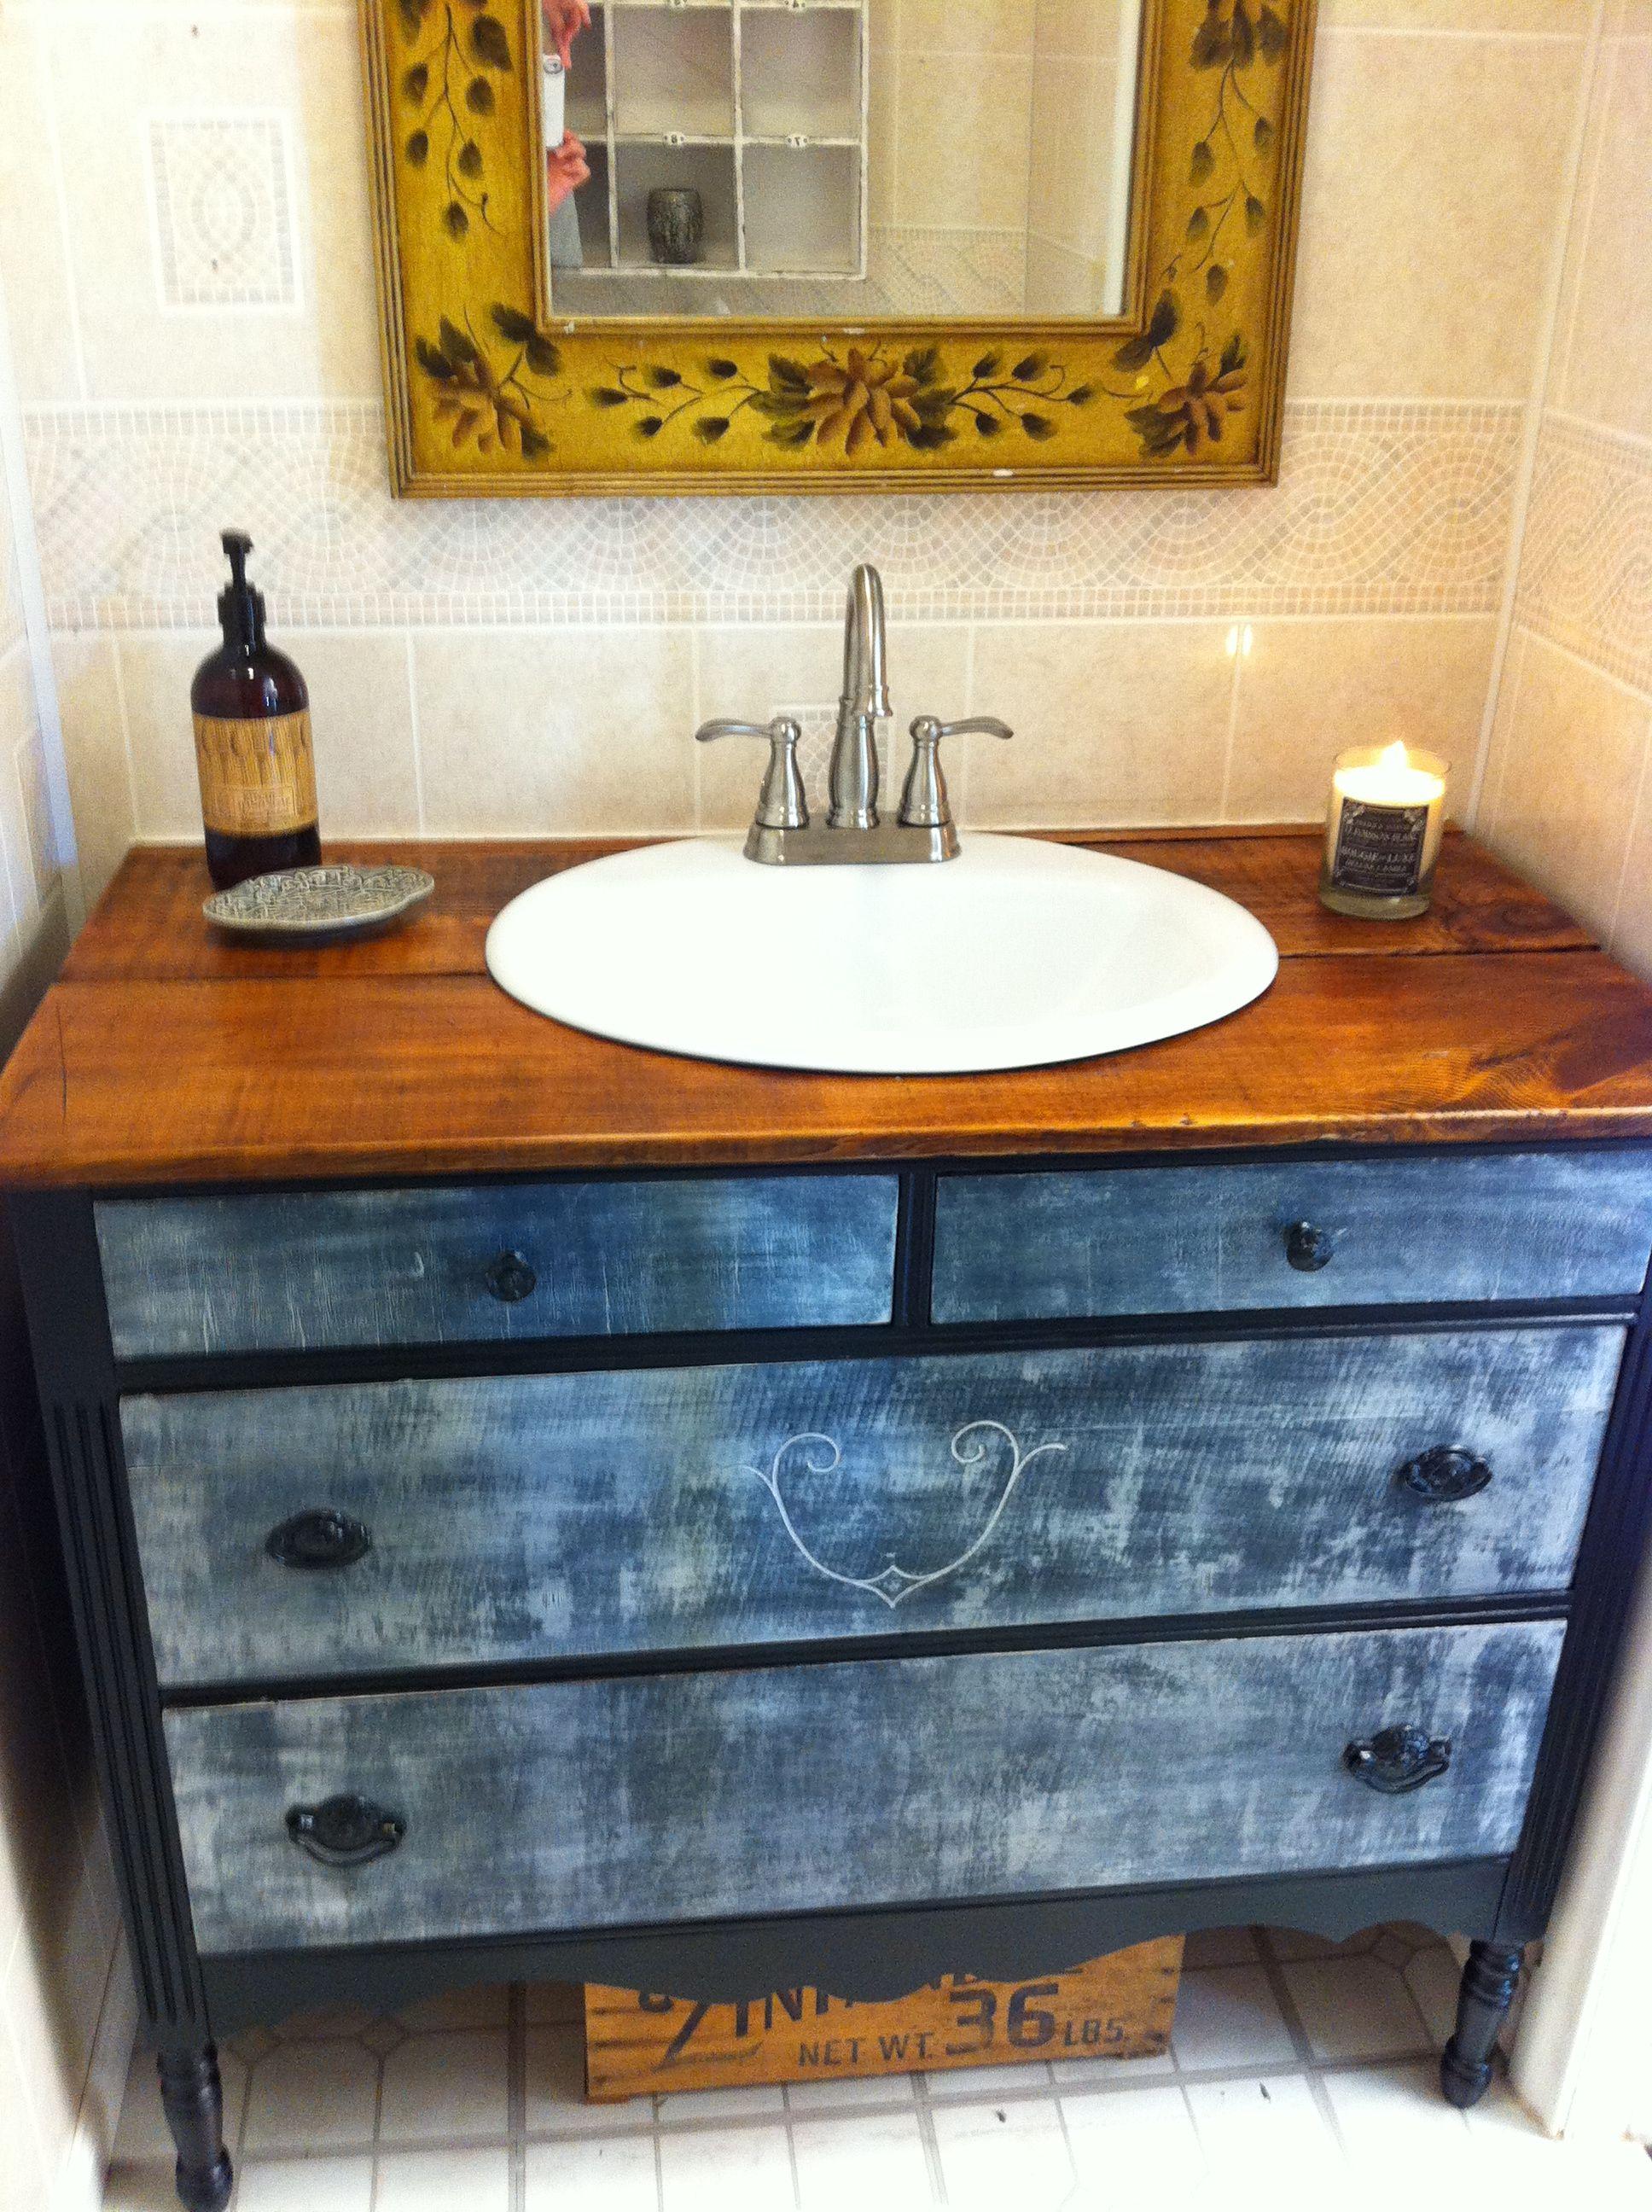 Repurposed antique dresser, now a beautiful bathroom sink! | It is ...